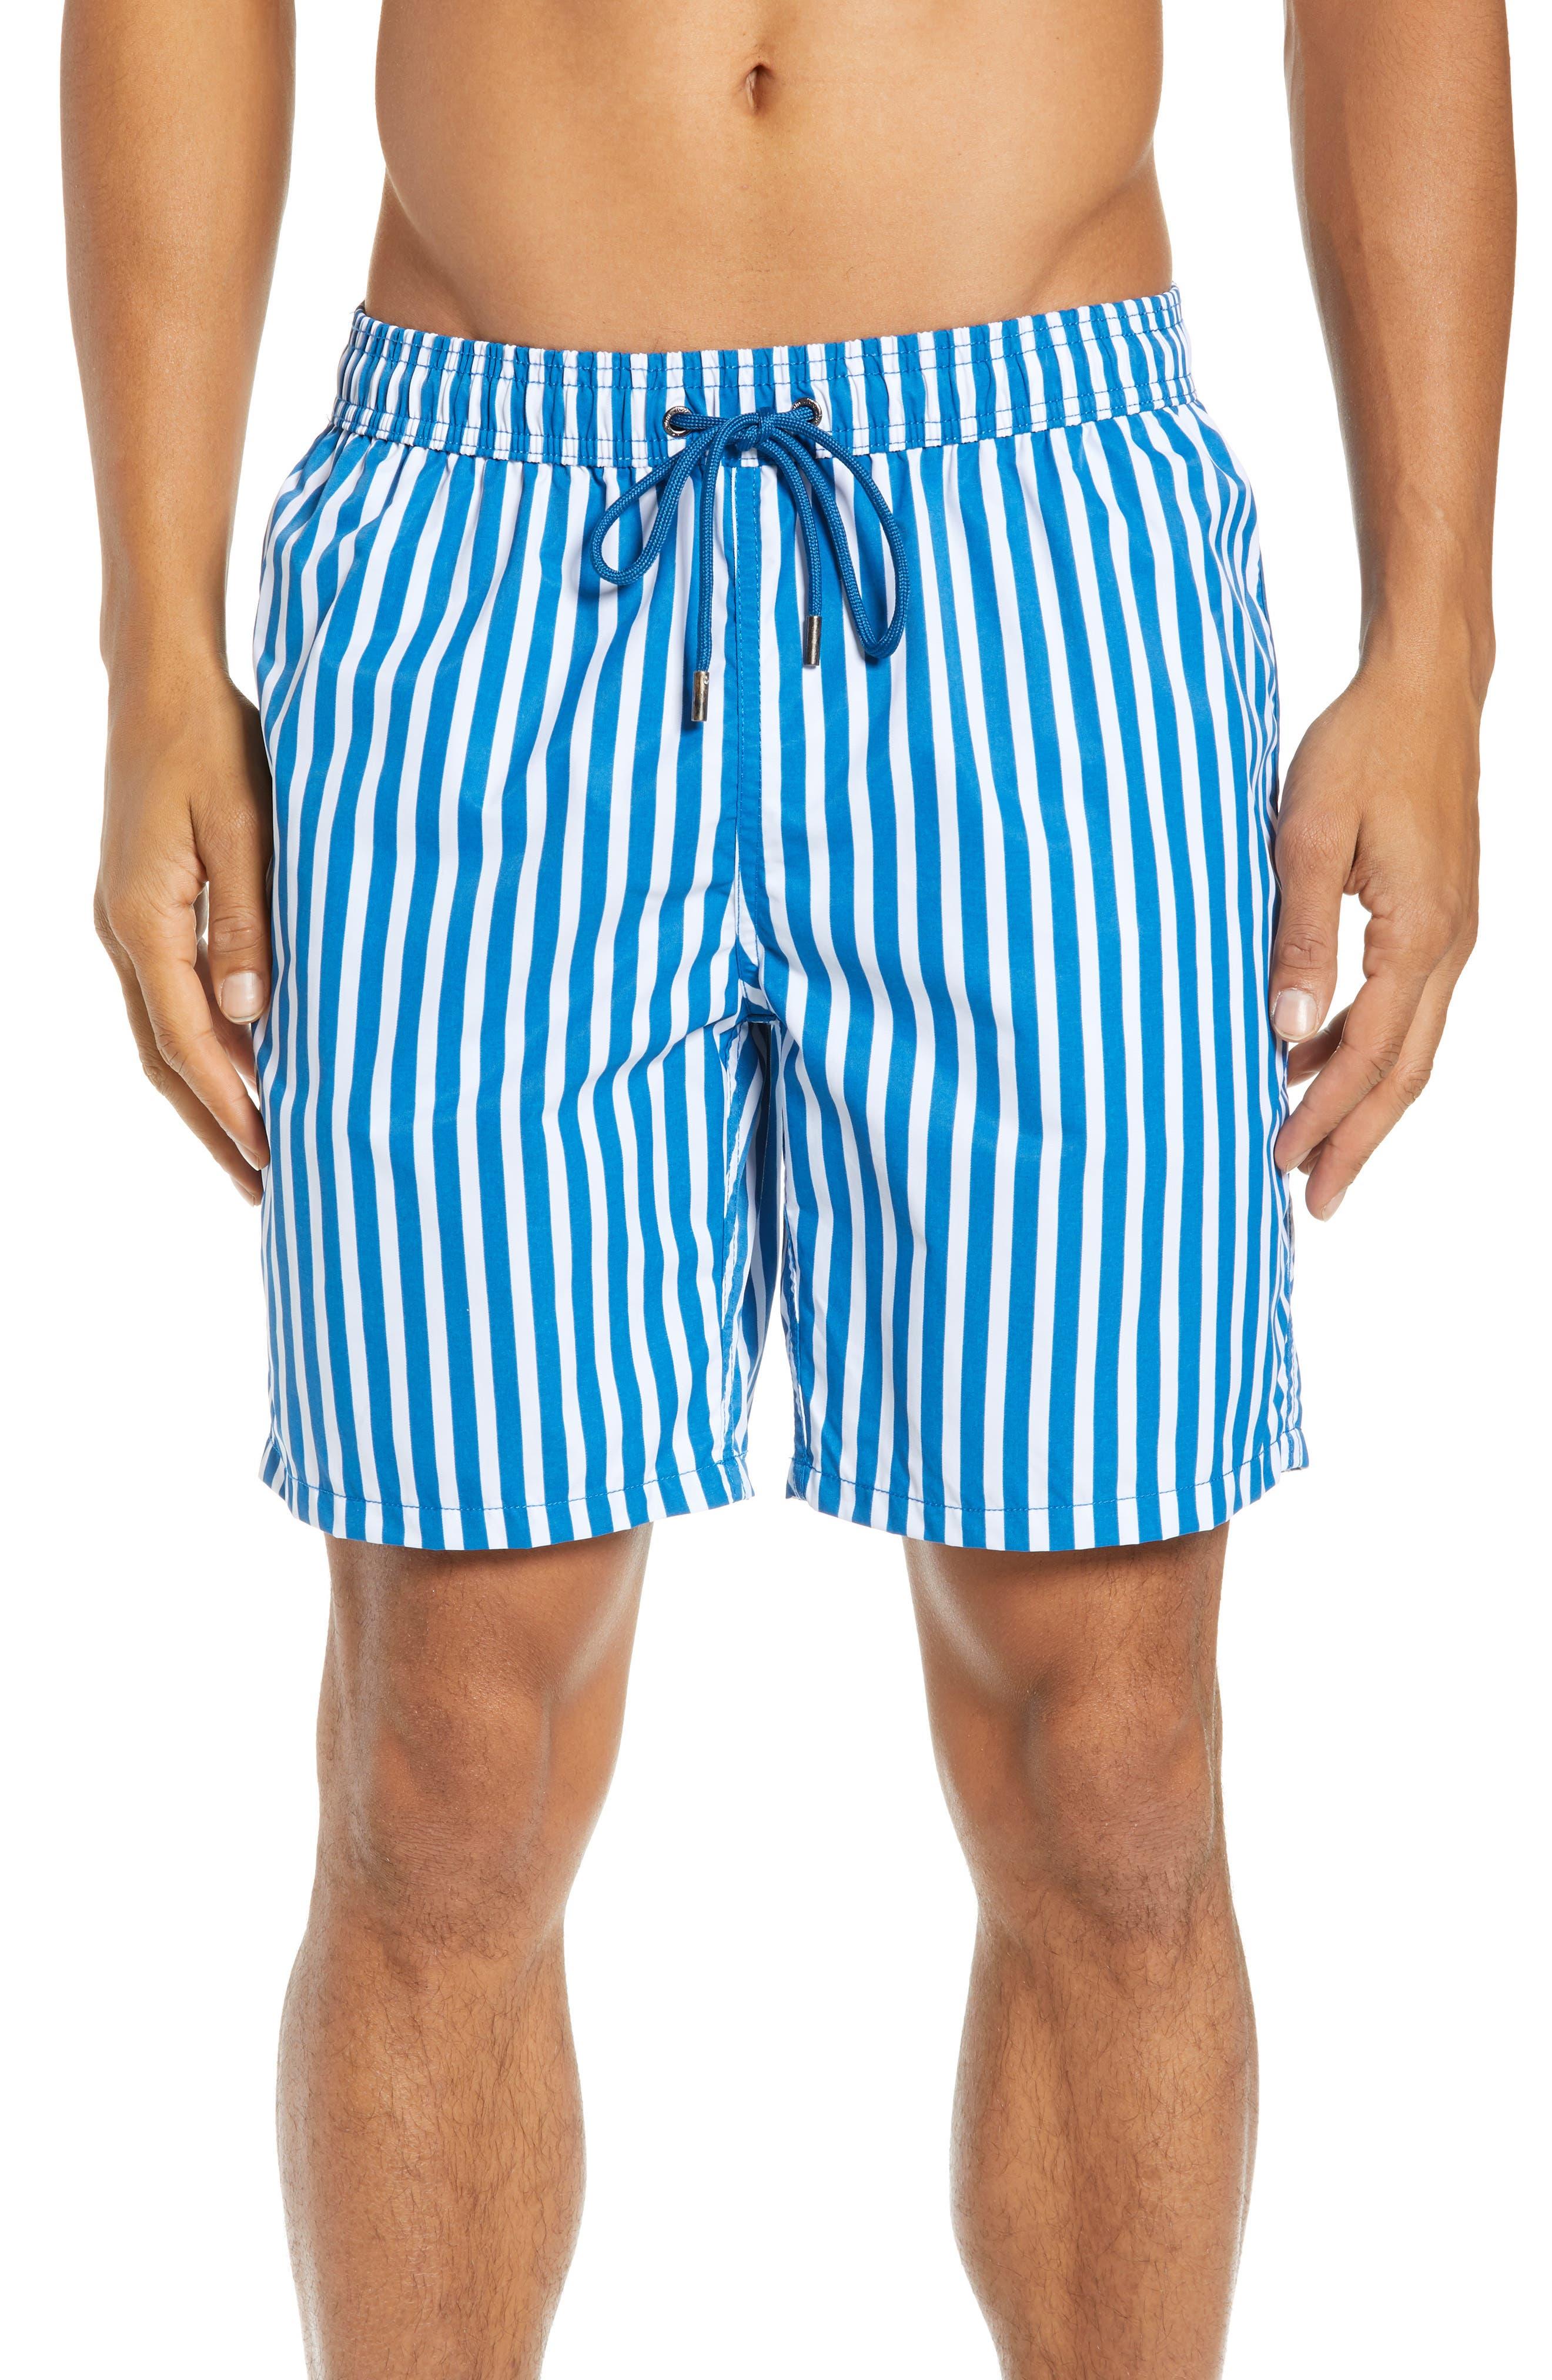 1960s Menswear Outfits | 60s Fashion for Guys Mens Mr. Swim Cabana Stripe Swim Trunks Size XX-Large - Blue $75.00 AT vintagedancer.com